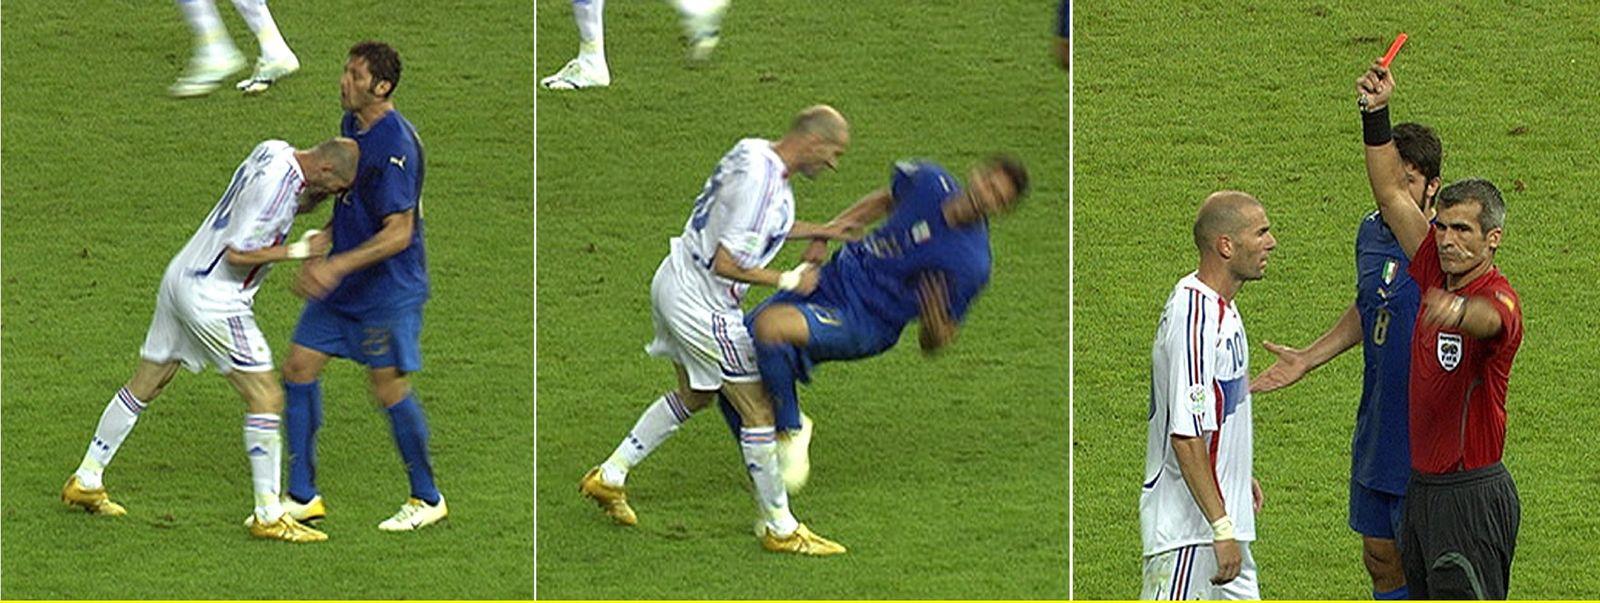 Zinedine Zidanes/ WM-Kopfstoß